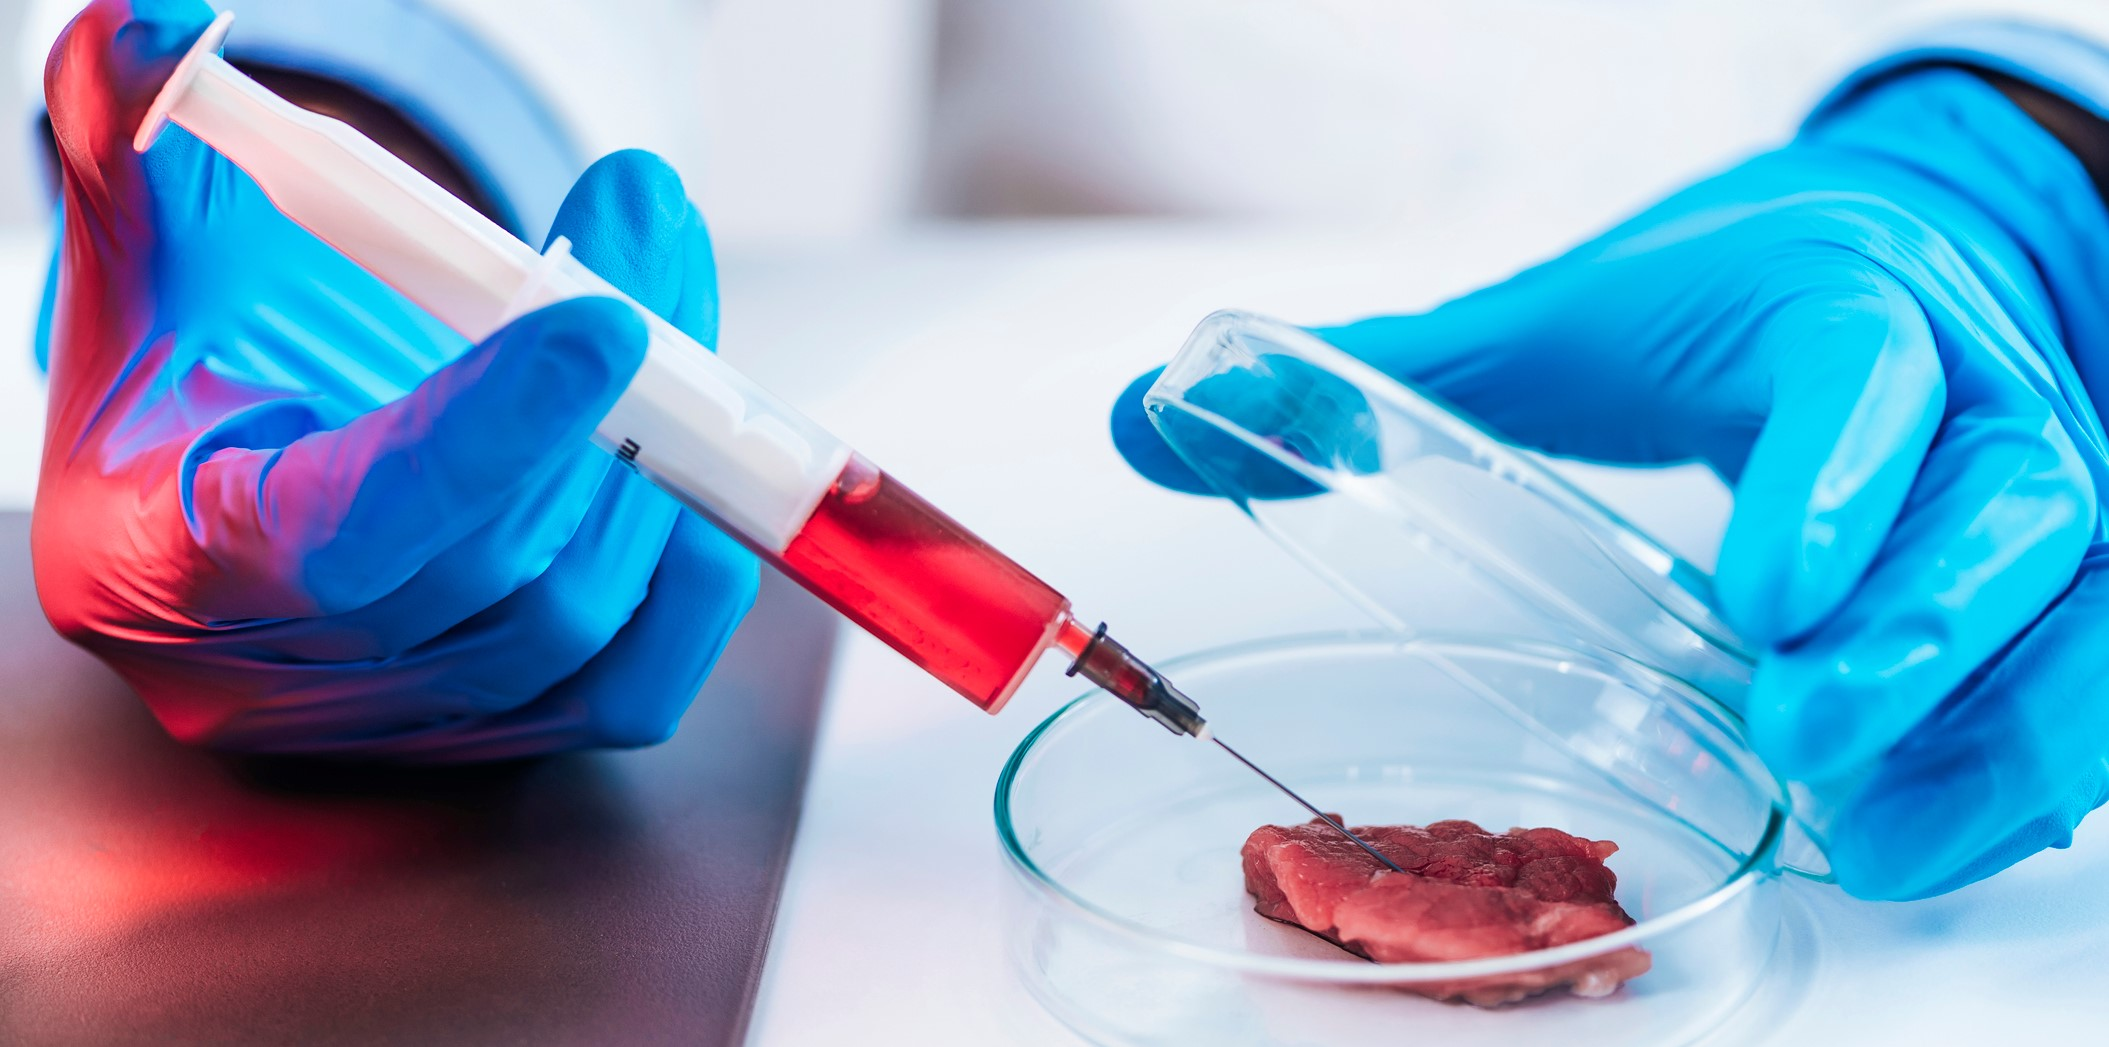 viande artificielle - in vitro - Sghaier Chriki